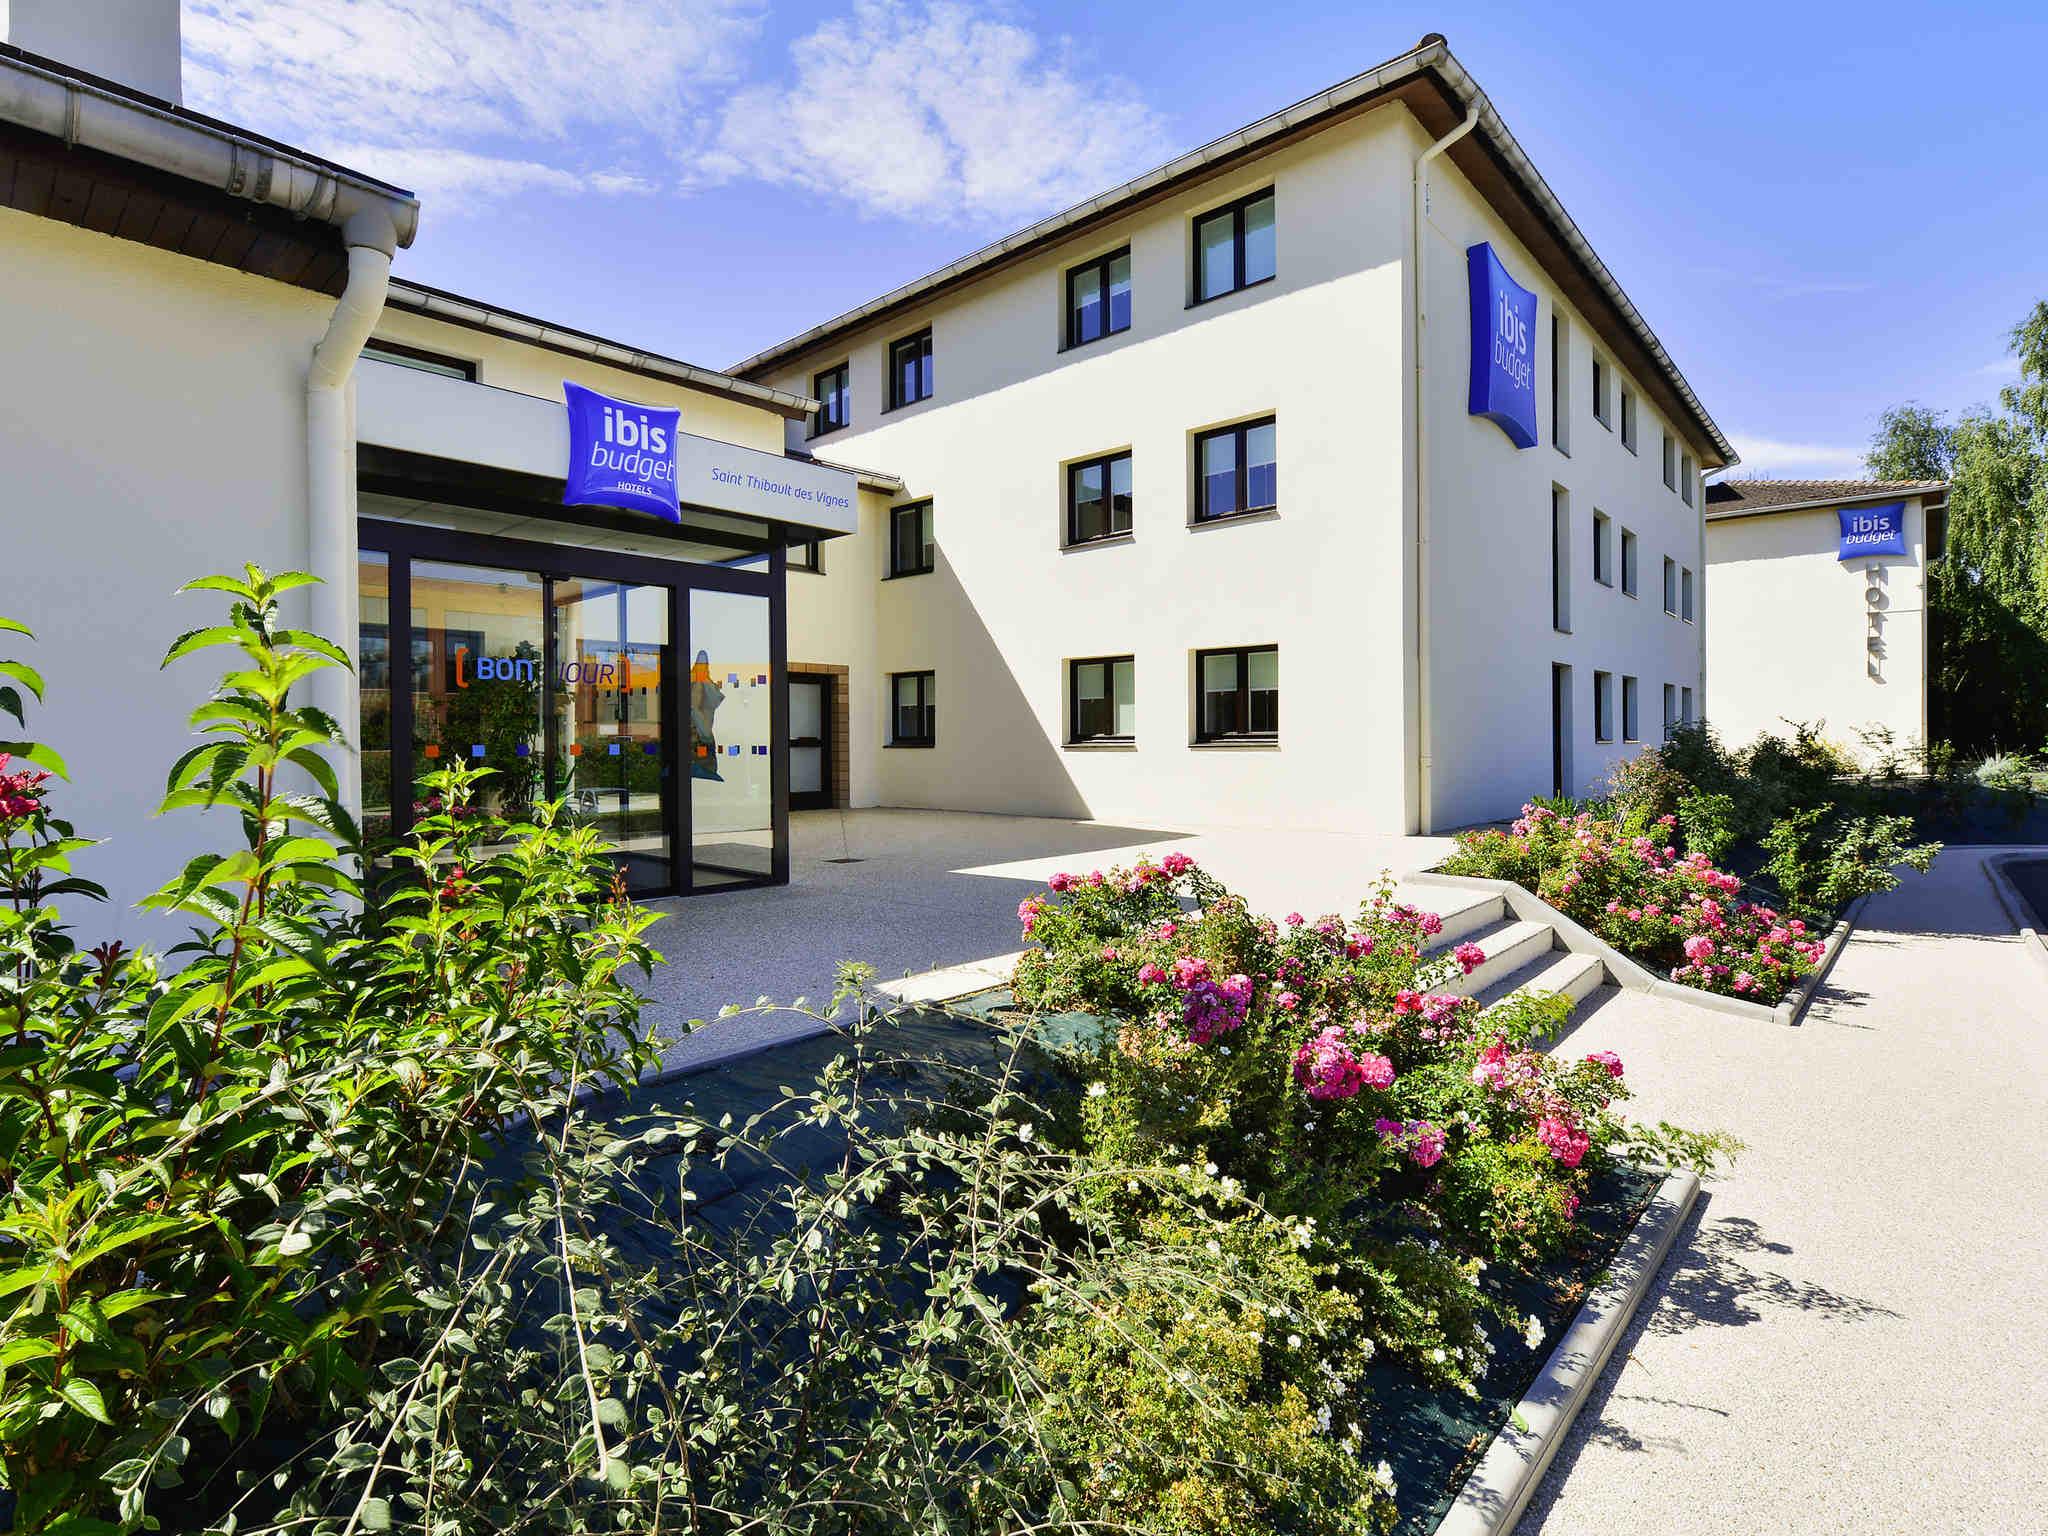 Hotel - ibis budget Marne la Vallée